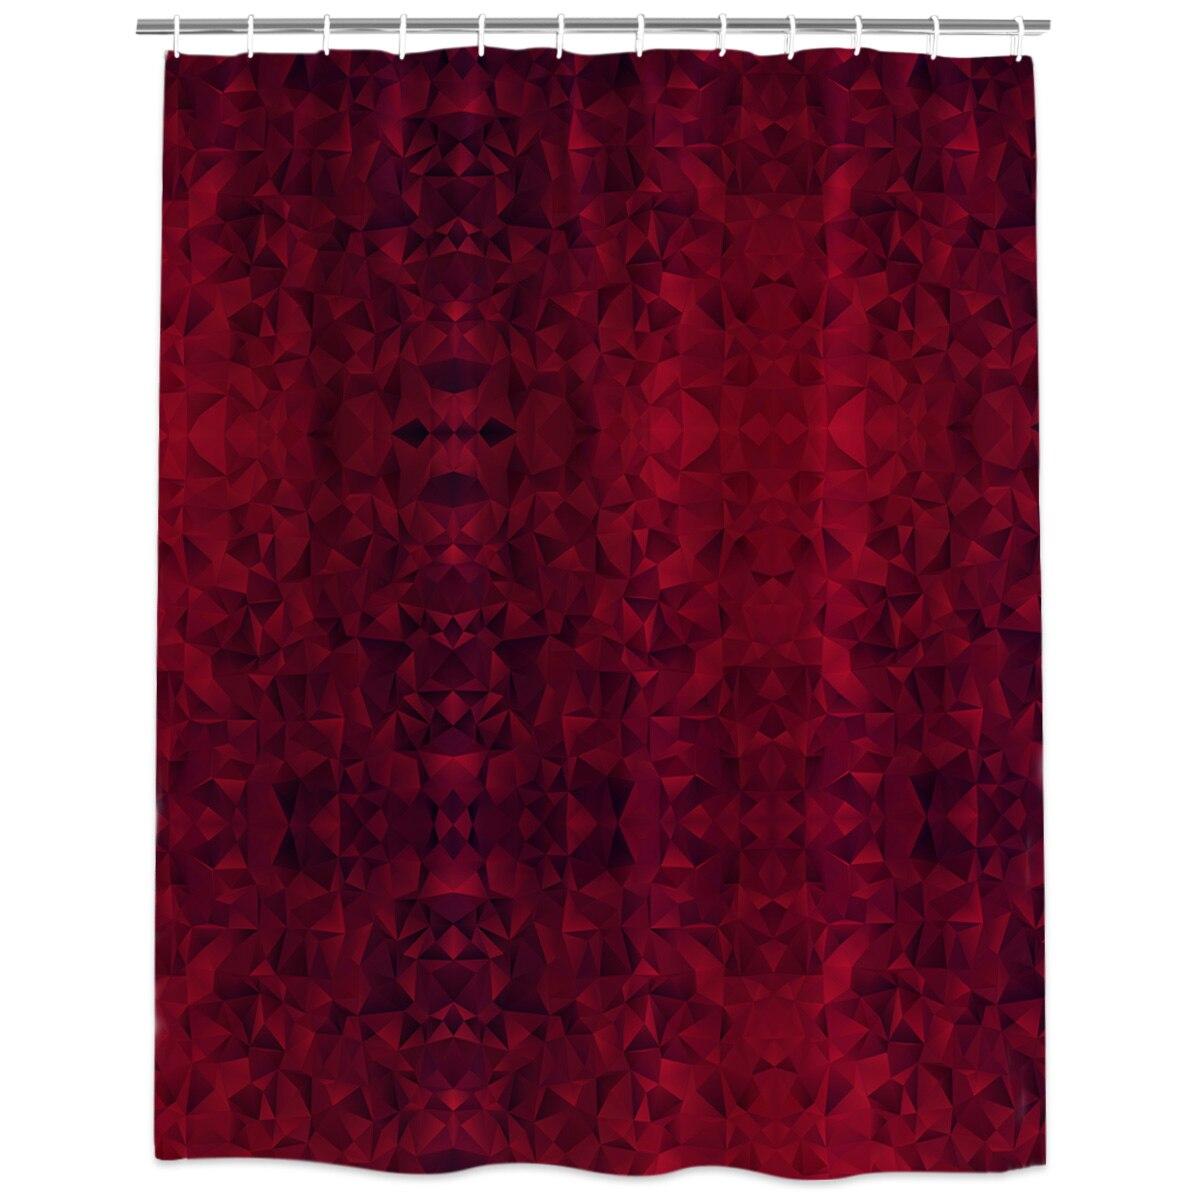 1 Shower Curtain Fabric Hooks Bathroom Set Bath Mats